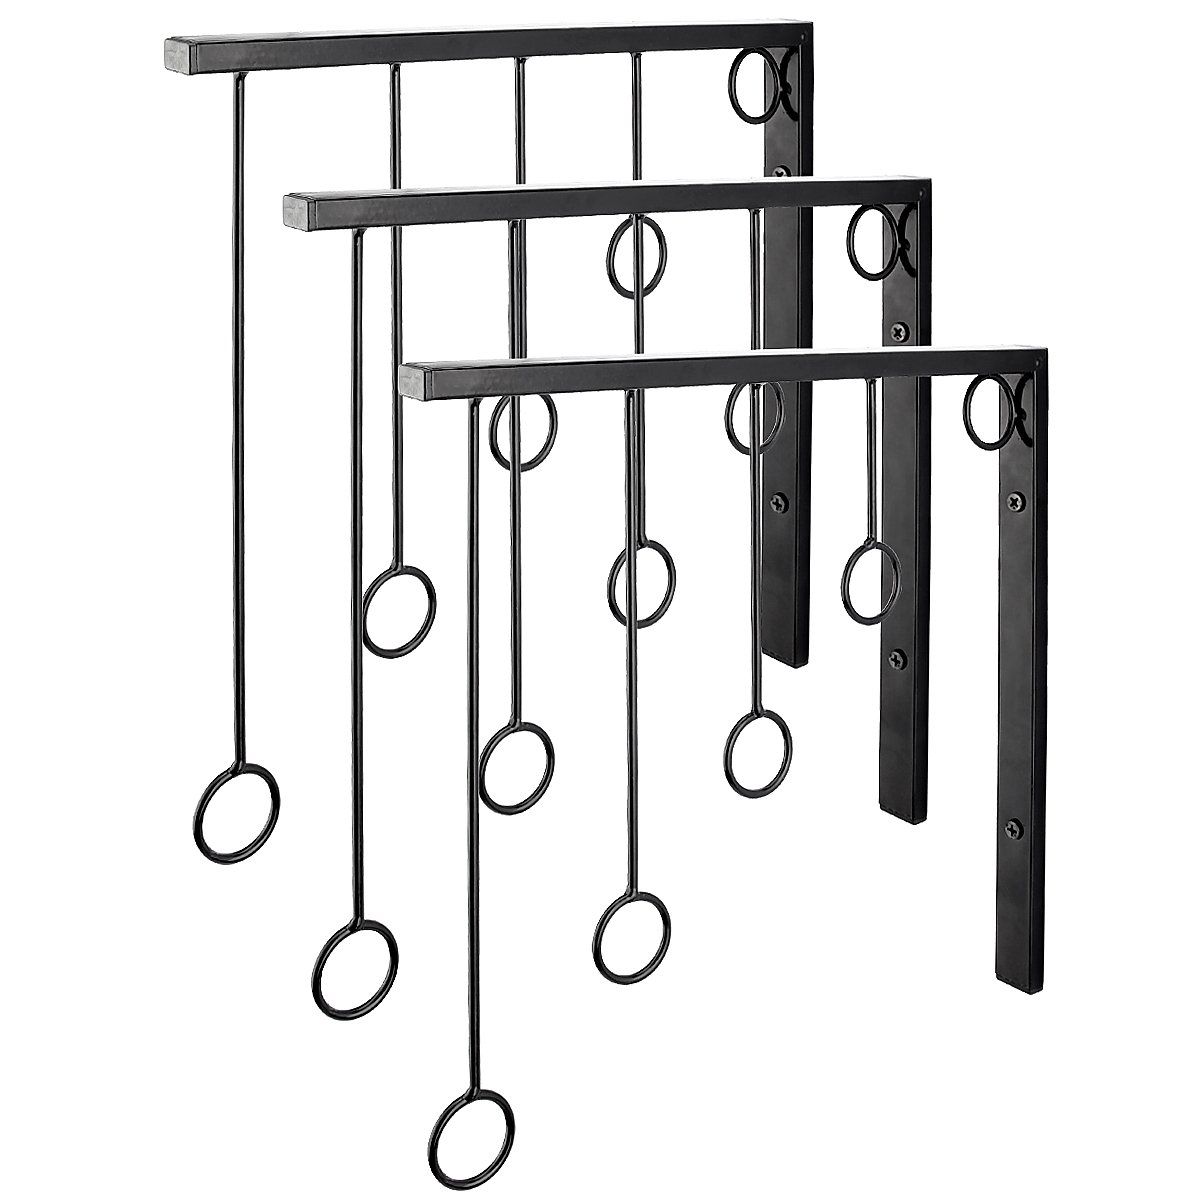 Kernorv Wall Clothing Rack, Wall Garment Racks 5 Rings Hanging Clothing Garment Rack (Set of 3, Black)